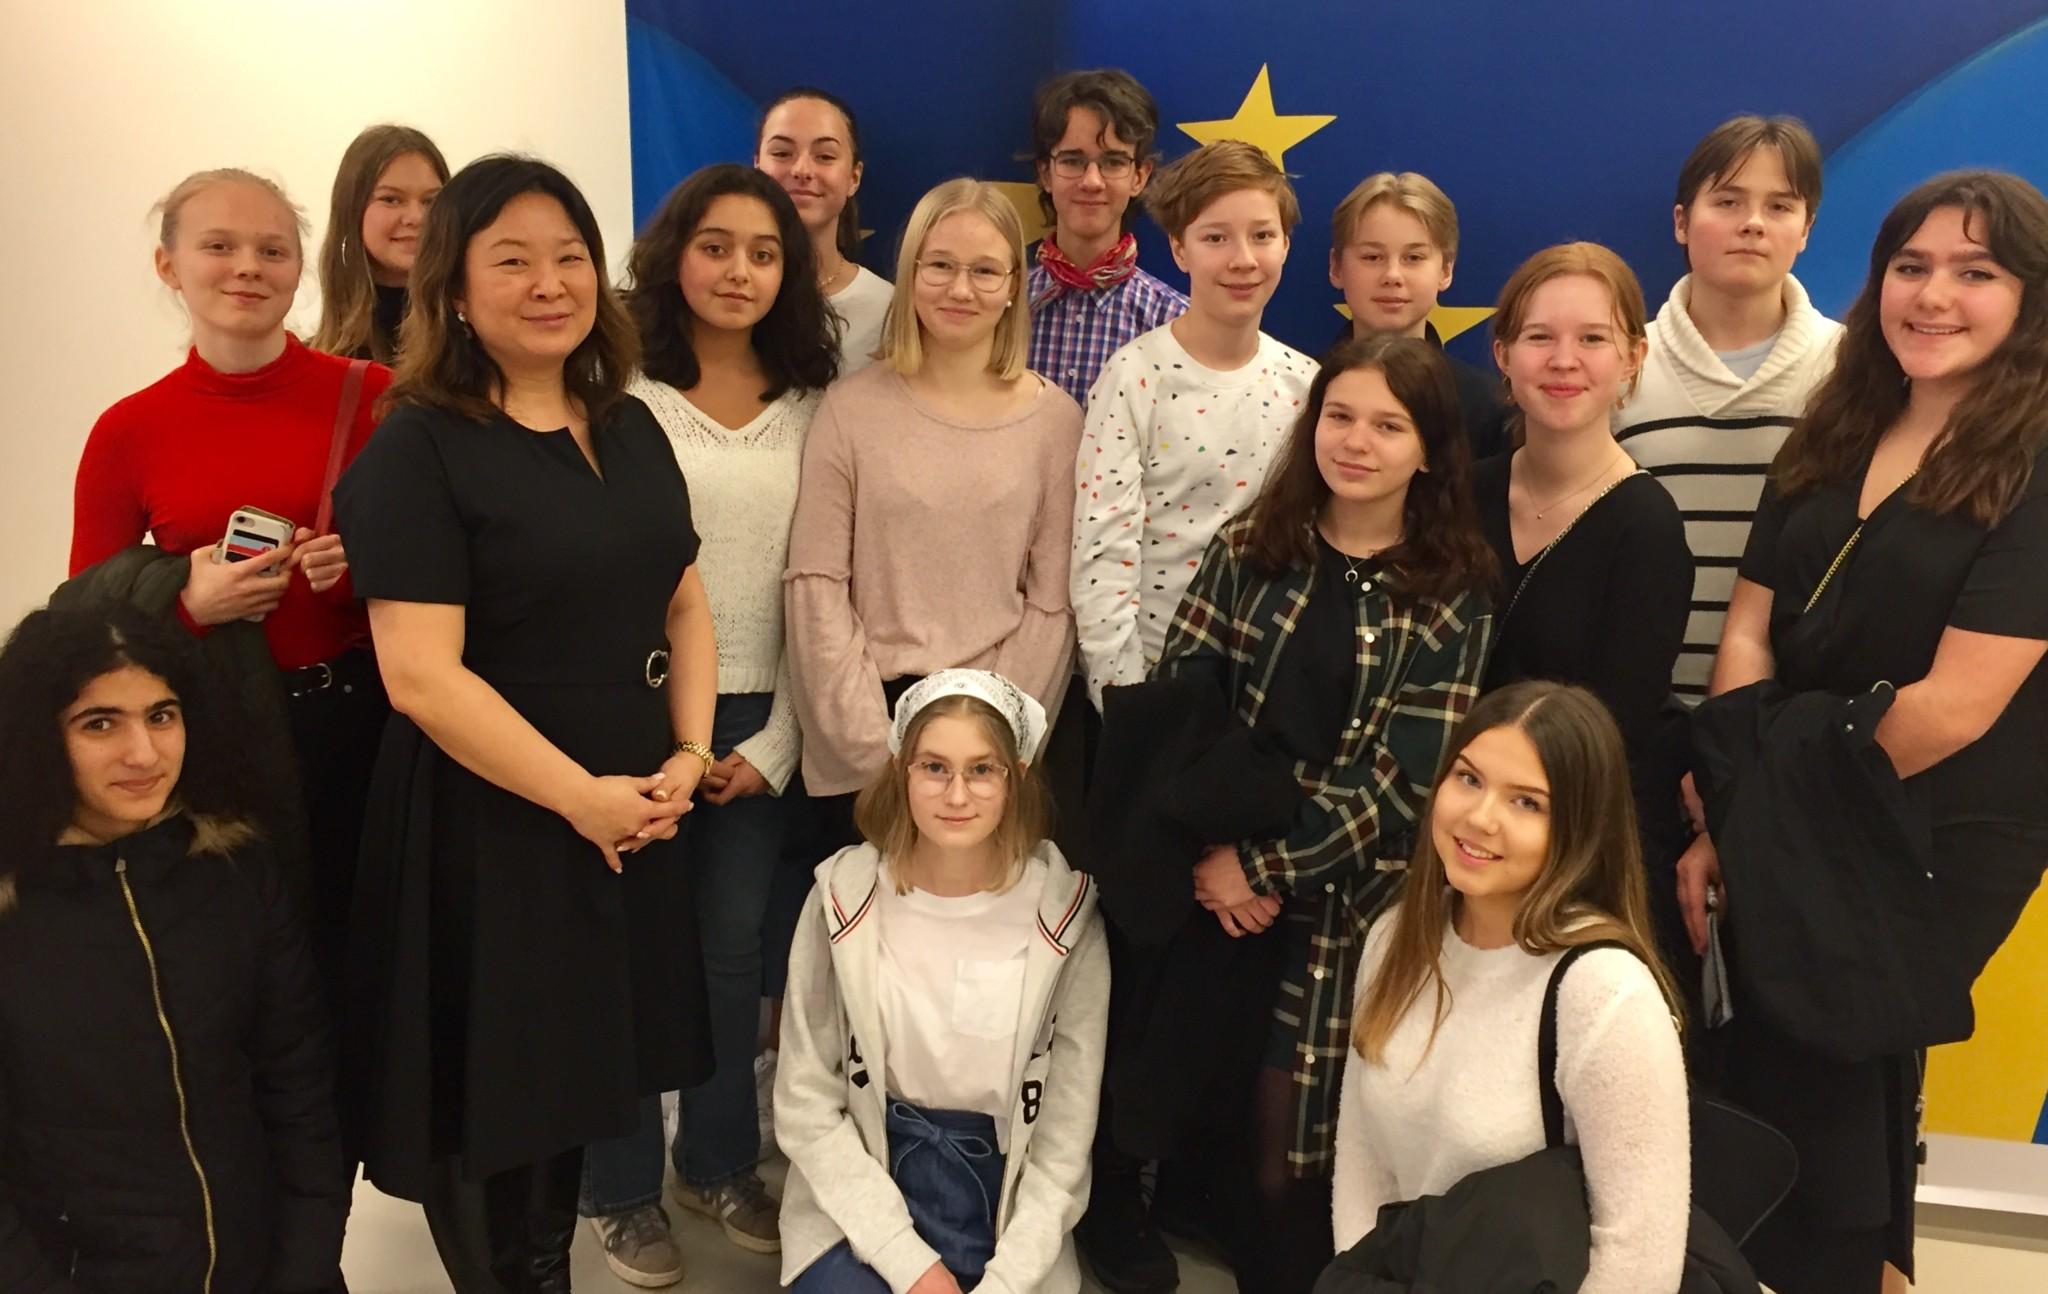 EU i fokus hos VRS Sundbyberg